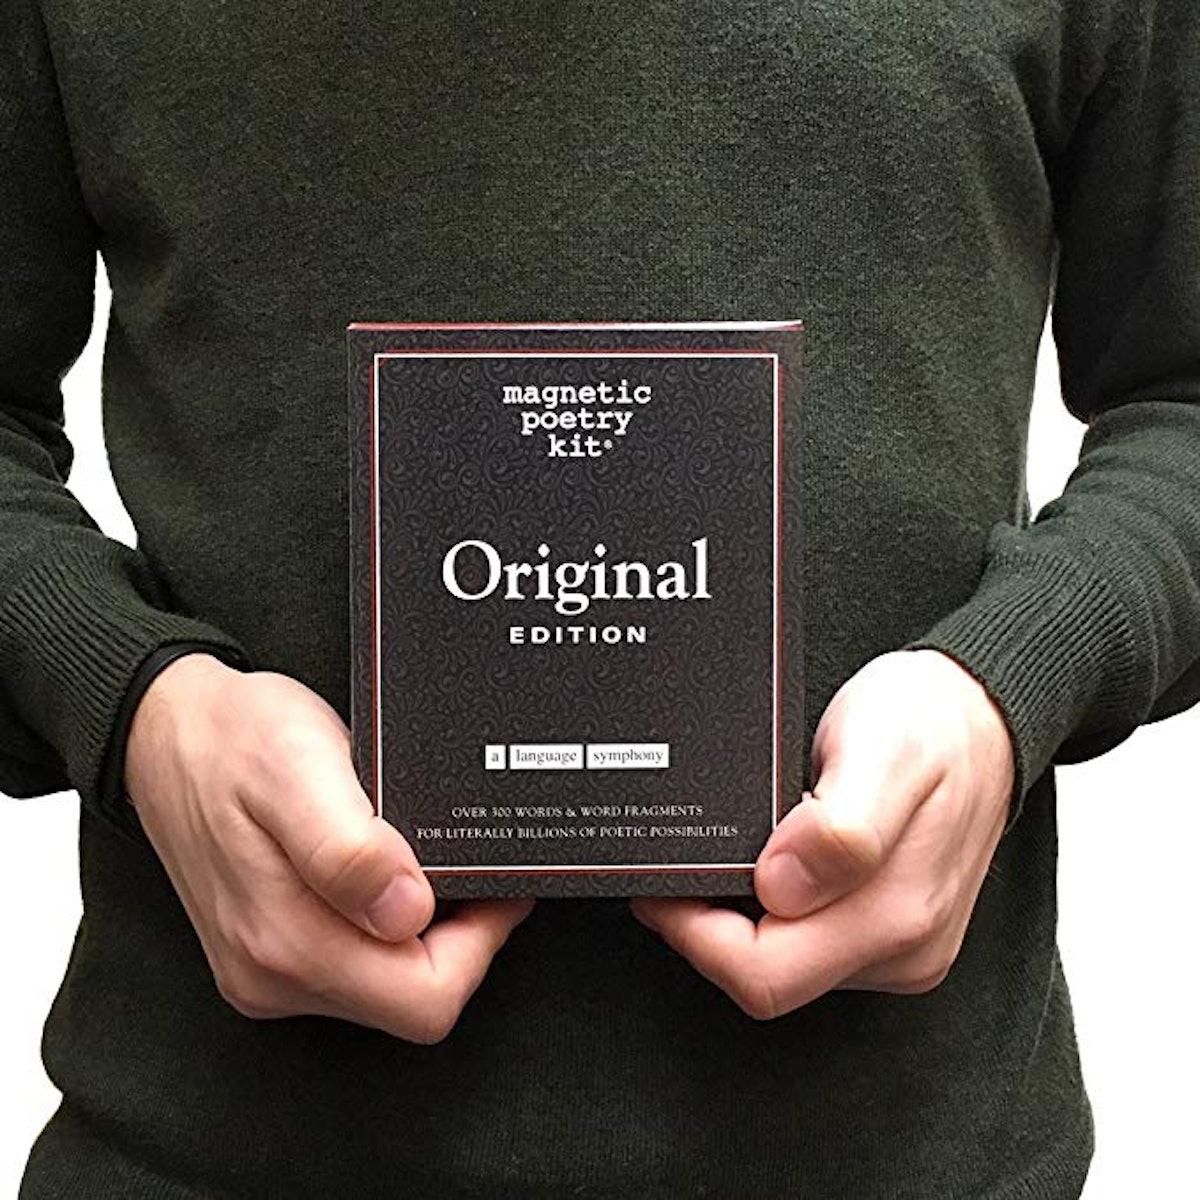 Magnetic Poetry - Original Kit